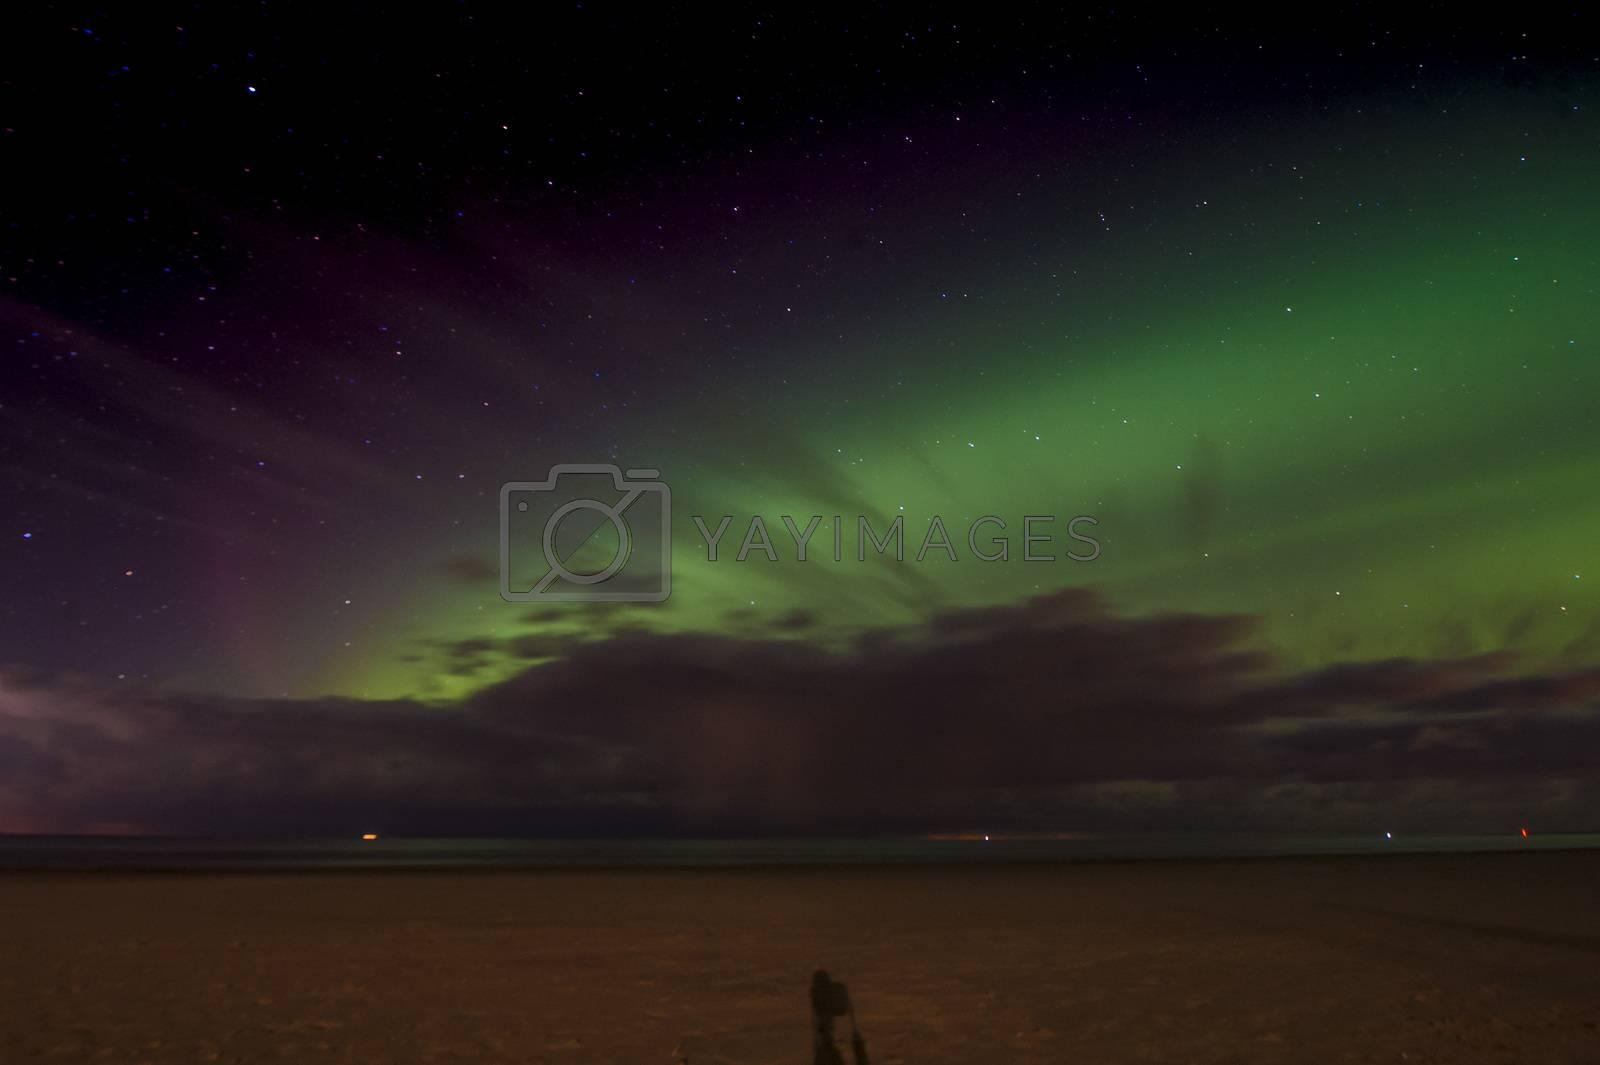 ESTONIA - ASTRONOMY - AURORA by newzulu